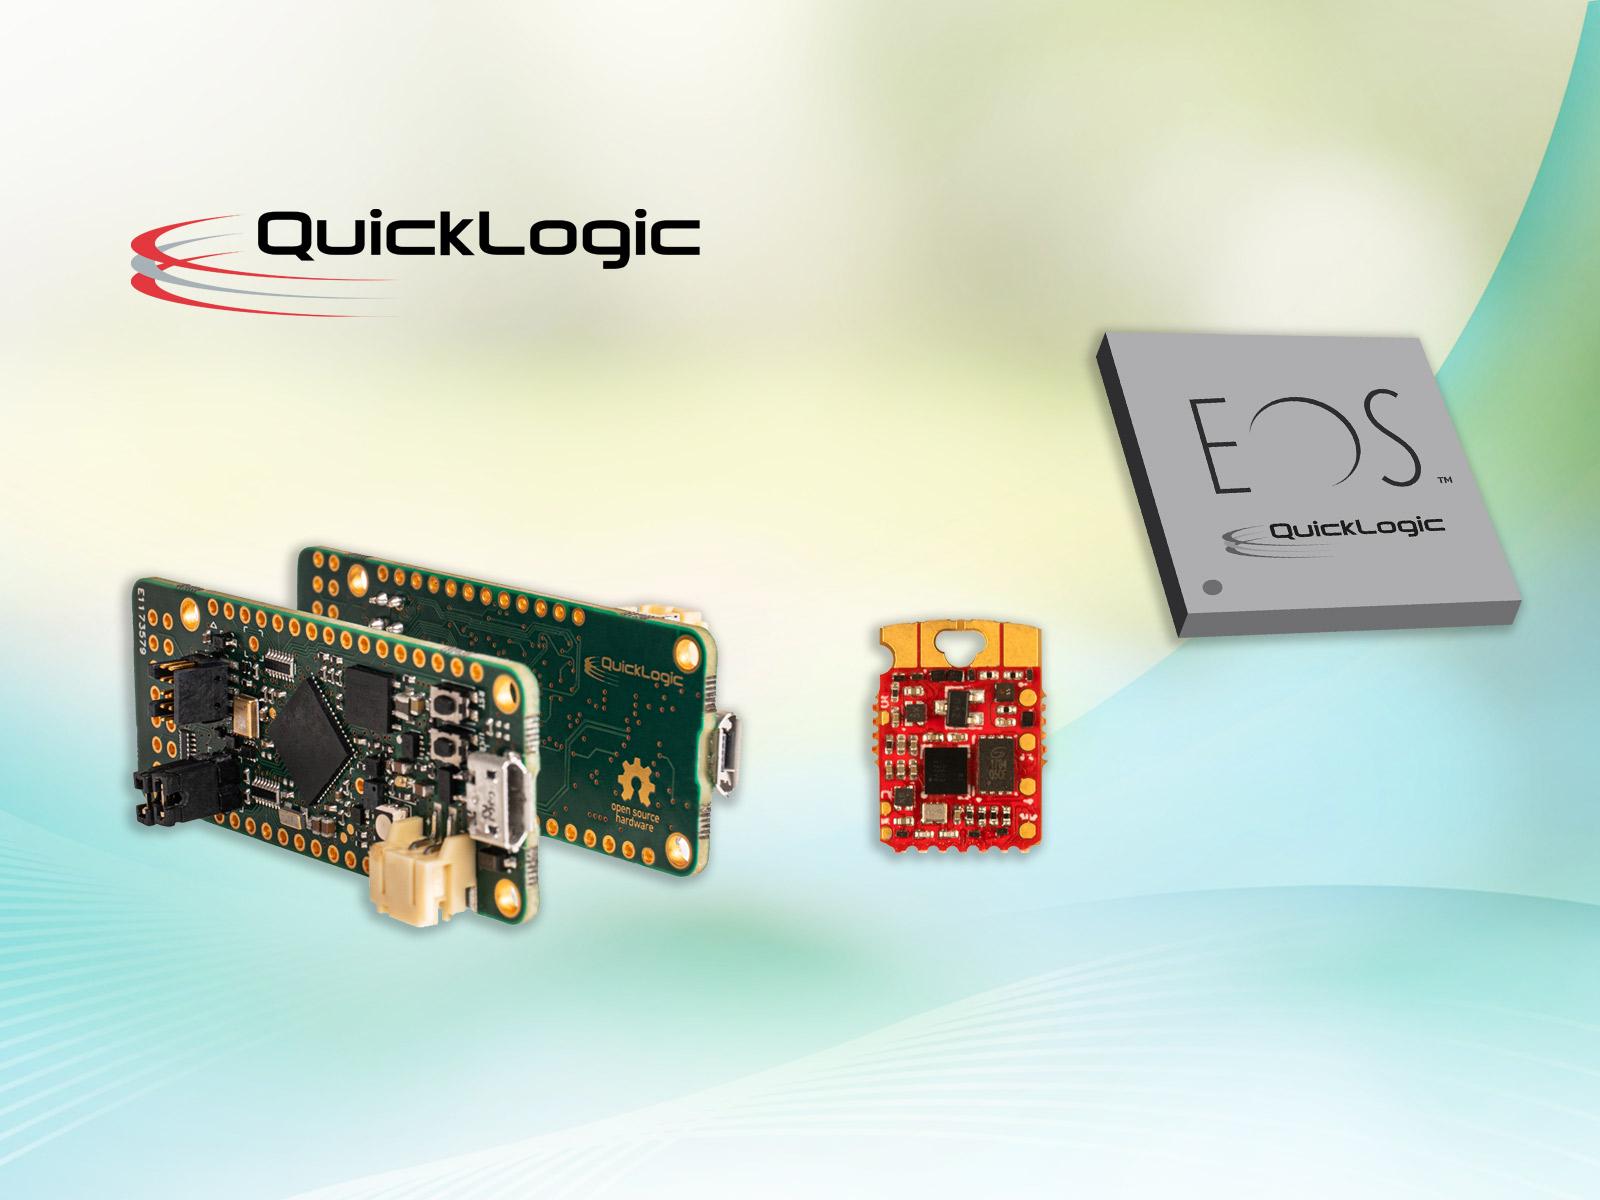 Digi-Key Electronics 宣布通过 Digi-Key 市场平台与 QuickLogic Corporation 建立全球合作伙伴关系